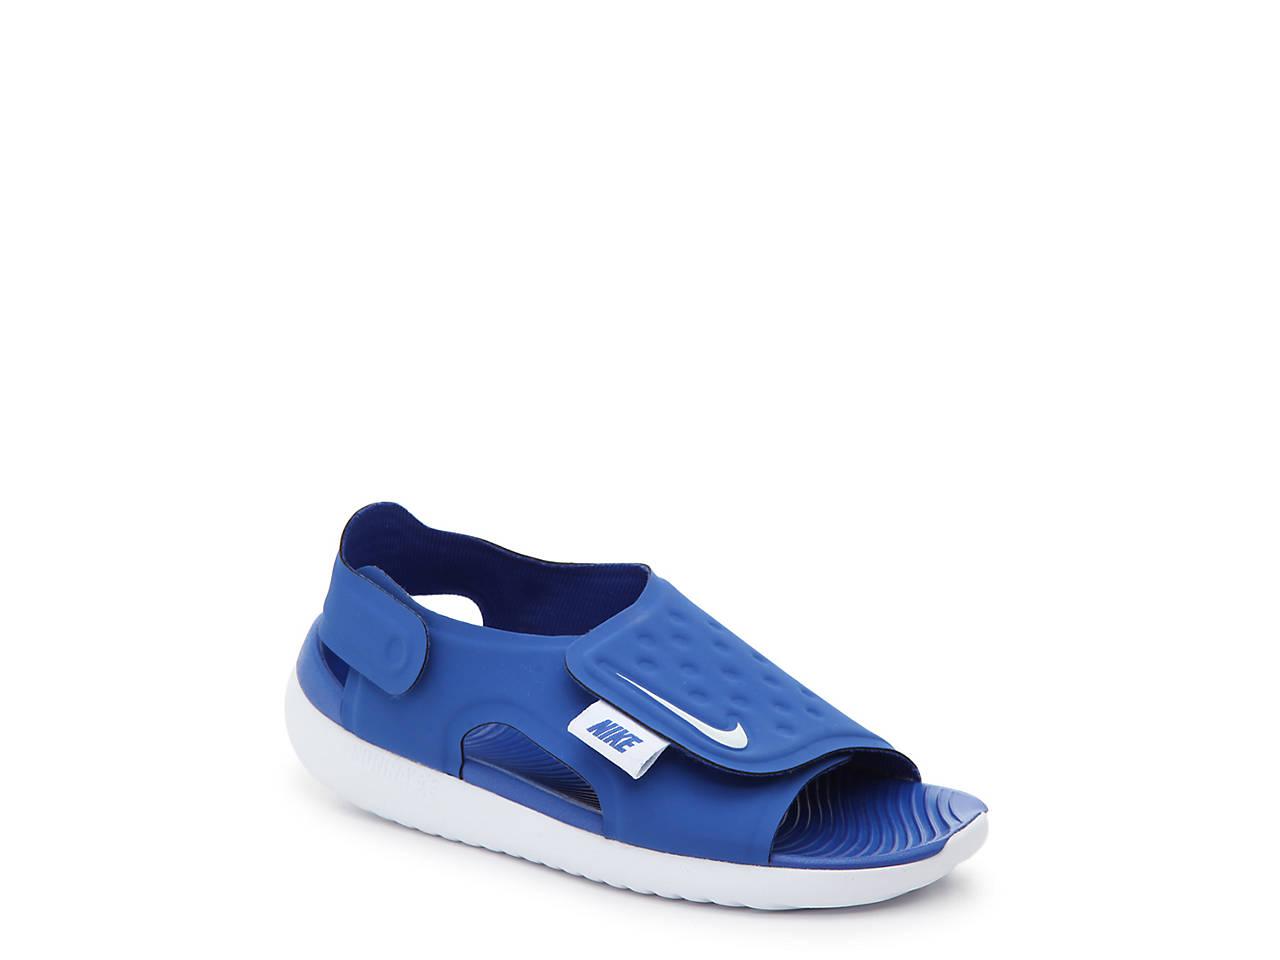 c1605c69cd07 Nike Sunray Adjust 5 Todder   Youth Sandal Kids Shoes